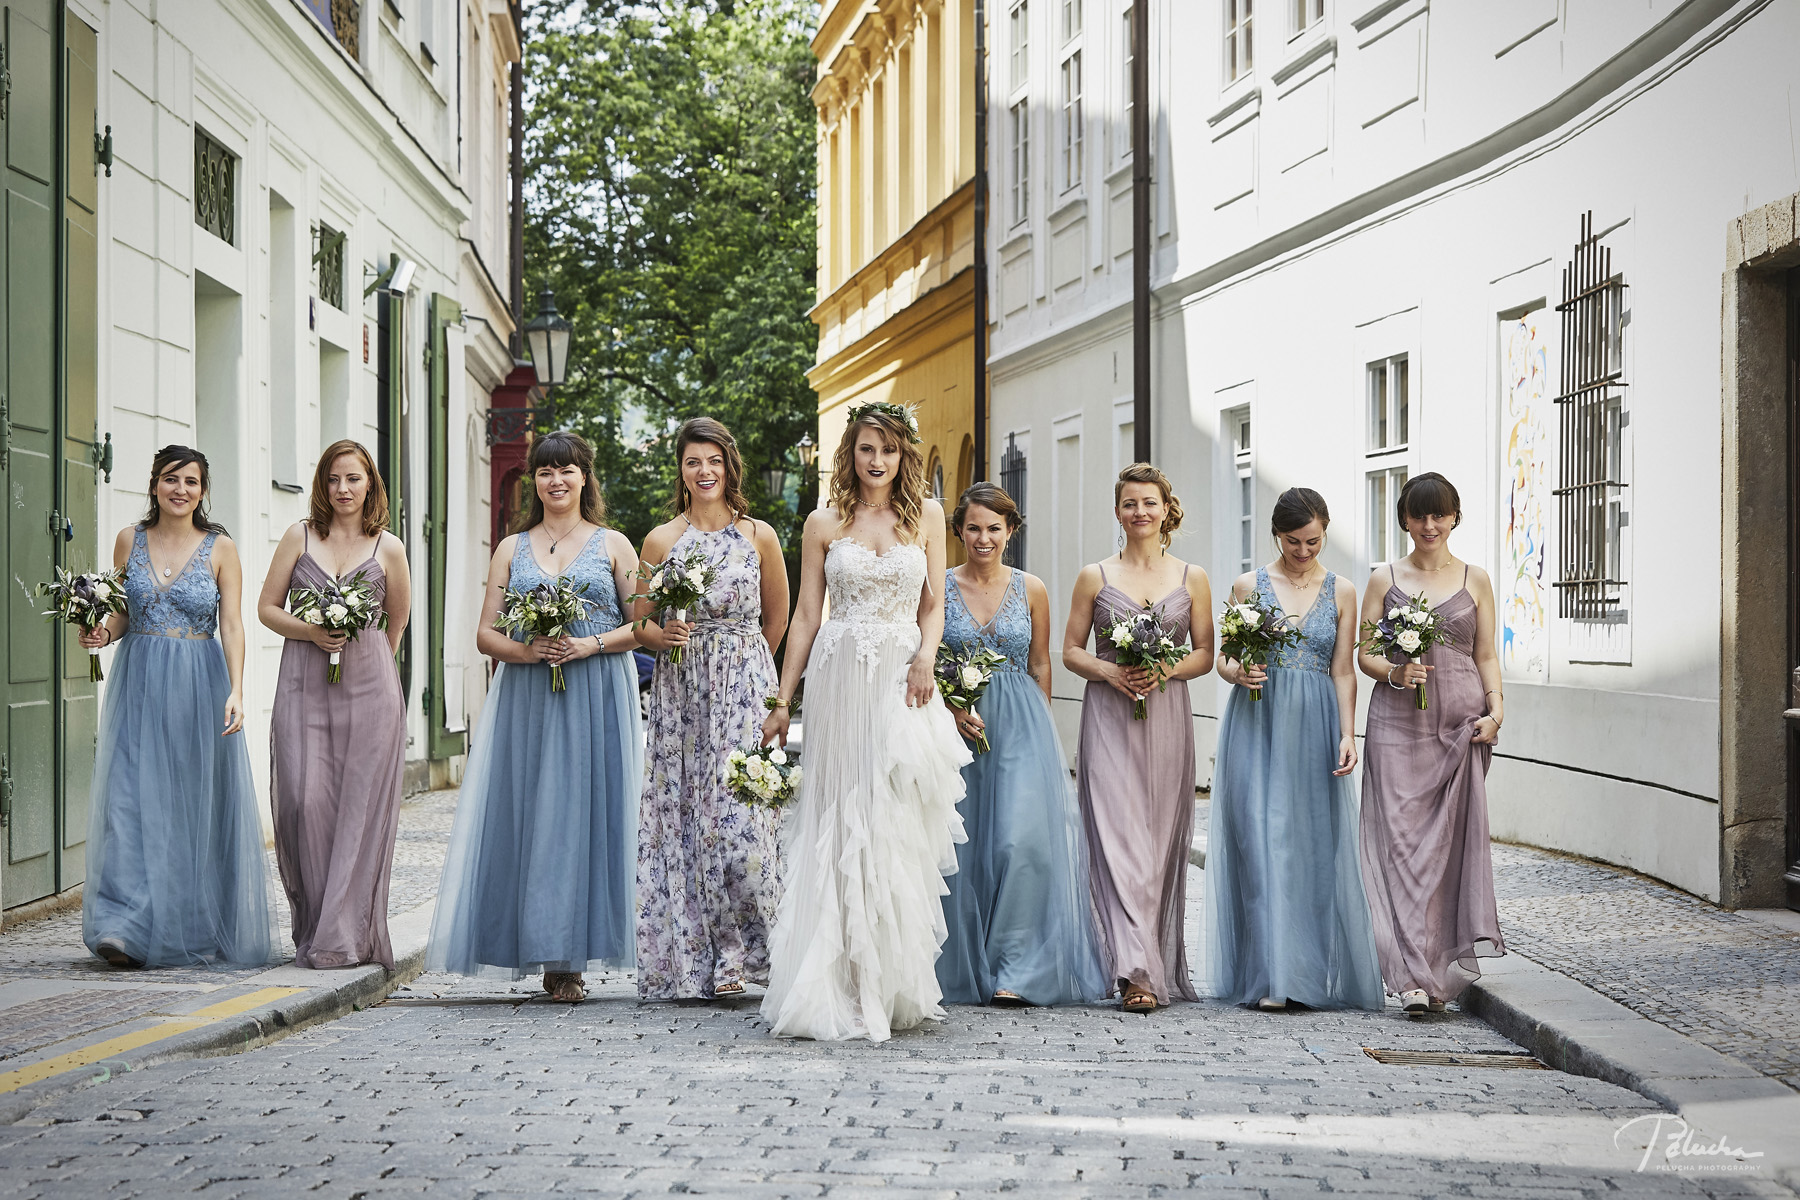 Bridesmaids (including me!)